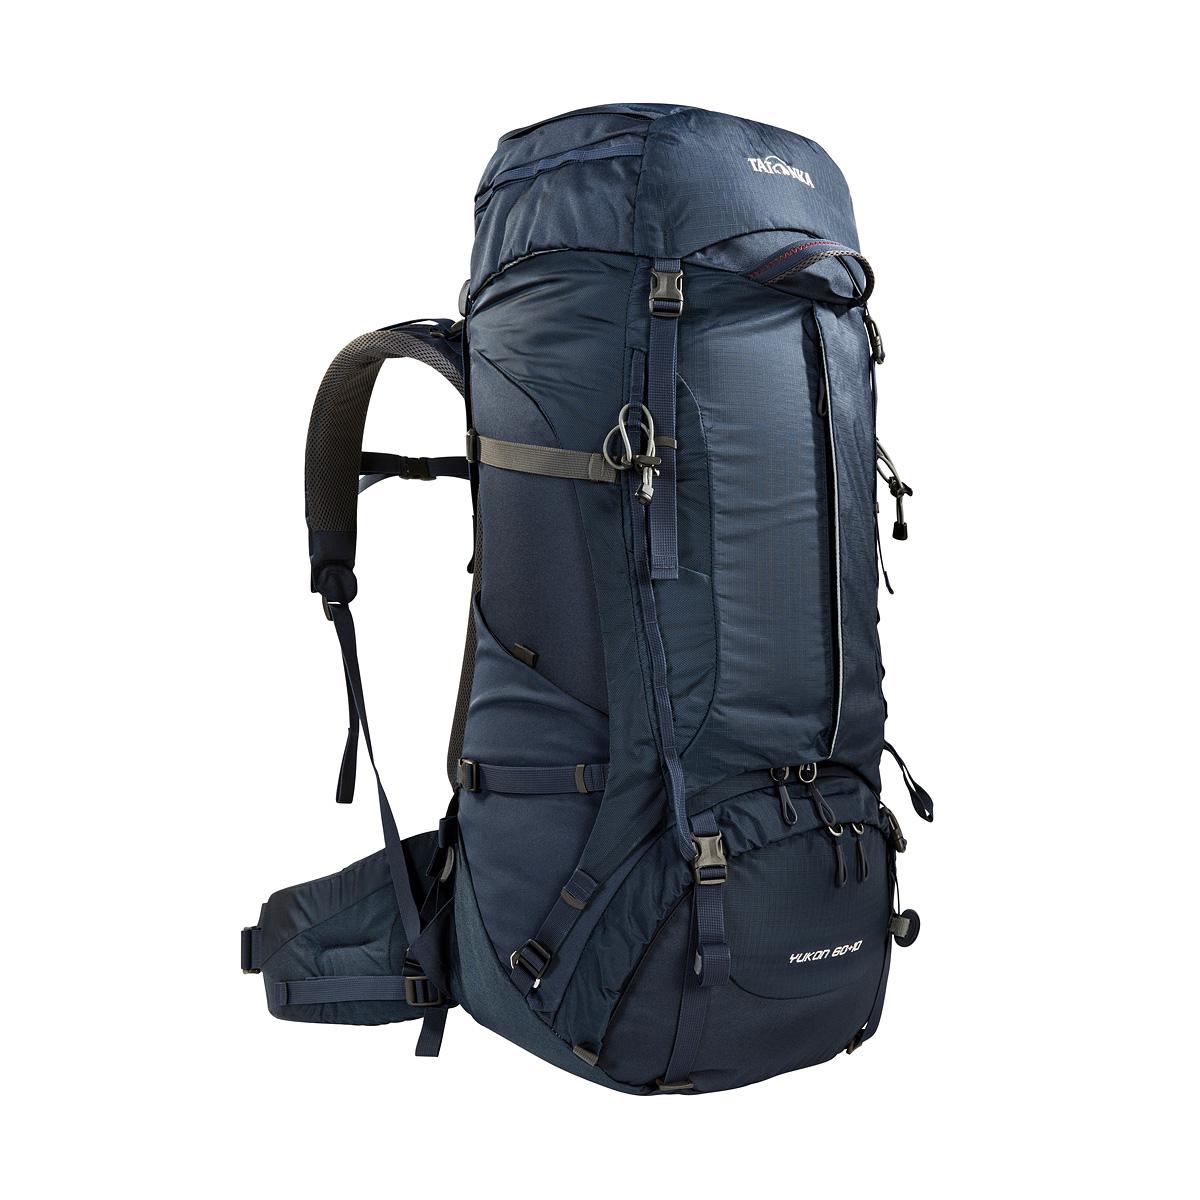 (Outzeit) Tatonka Yukon 60+10 (Trekking-) Rucksack